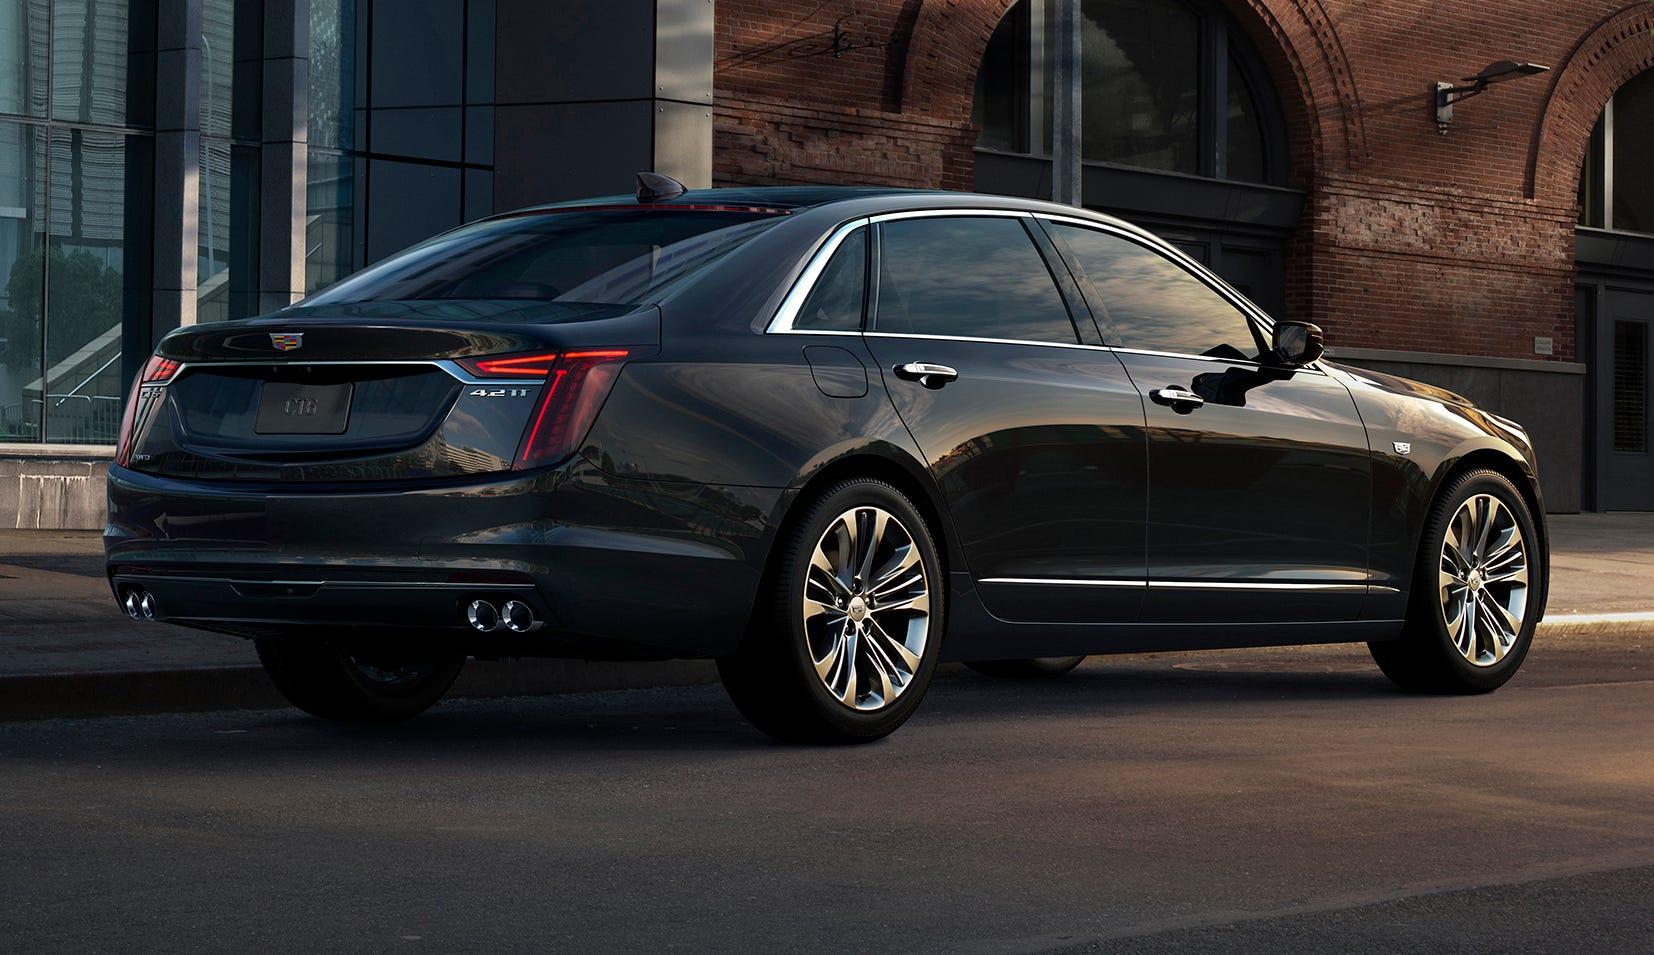 The 2019 Cadillac CT6 V-Sport